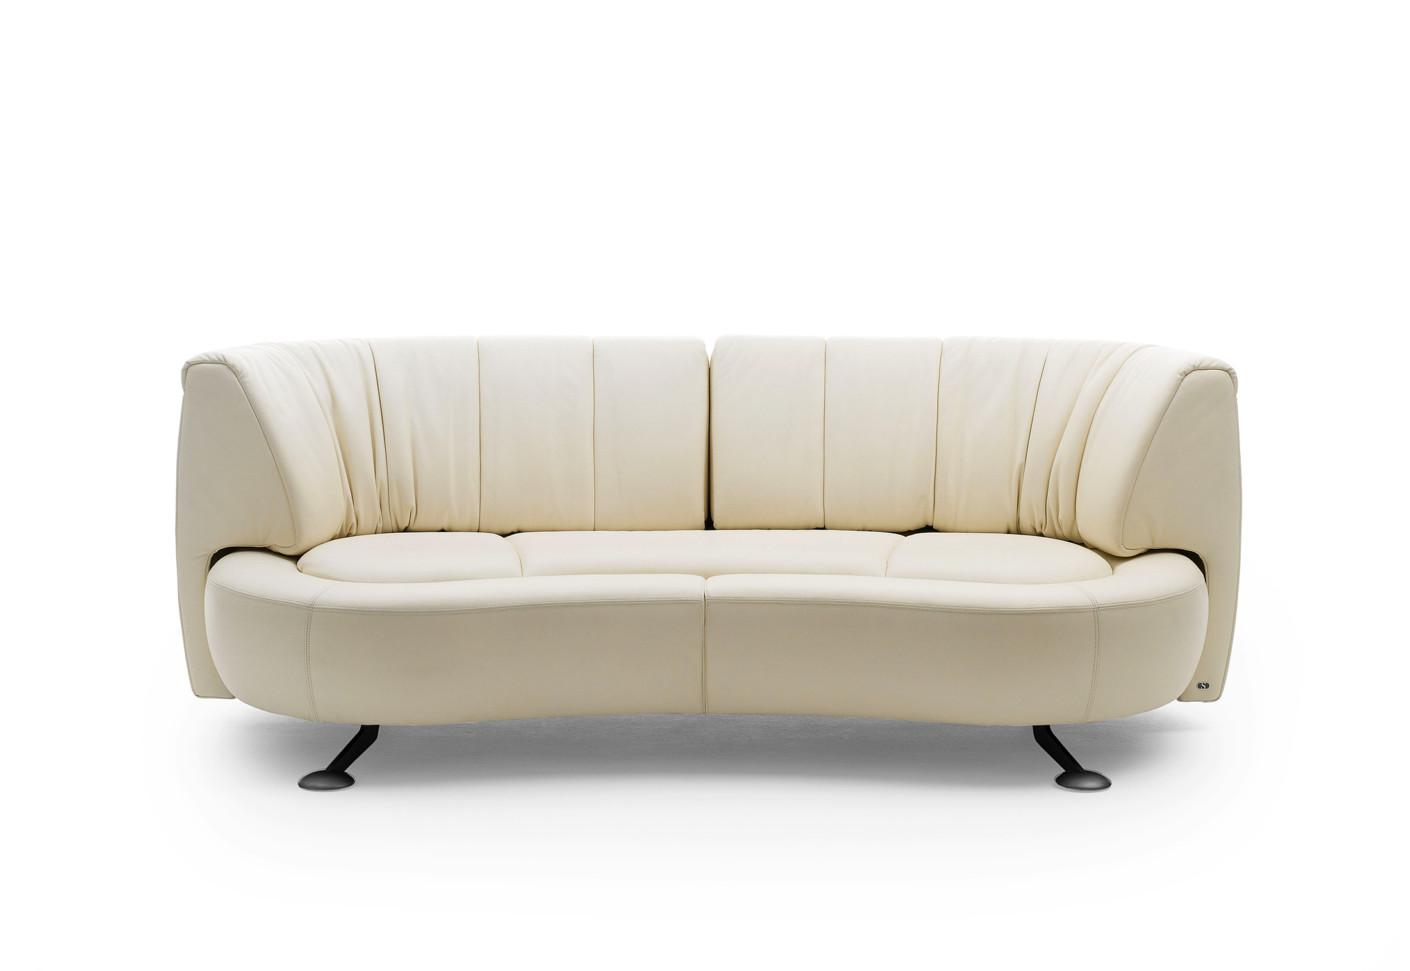 ds 164 sofa by de sede stylepark. Black Bedroom Furniture Sets. Home Design Ideas